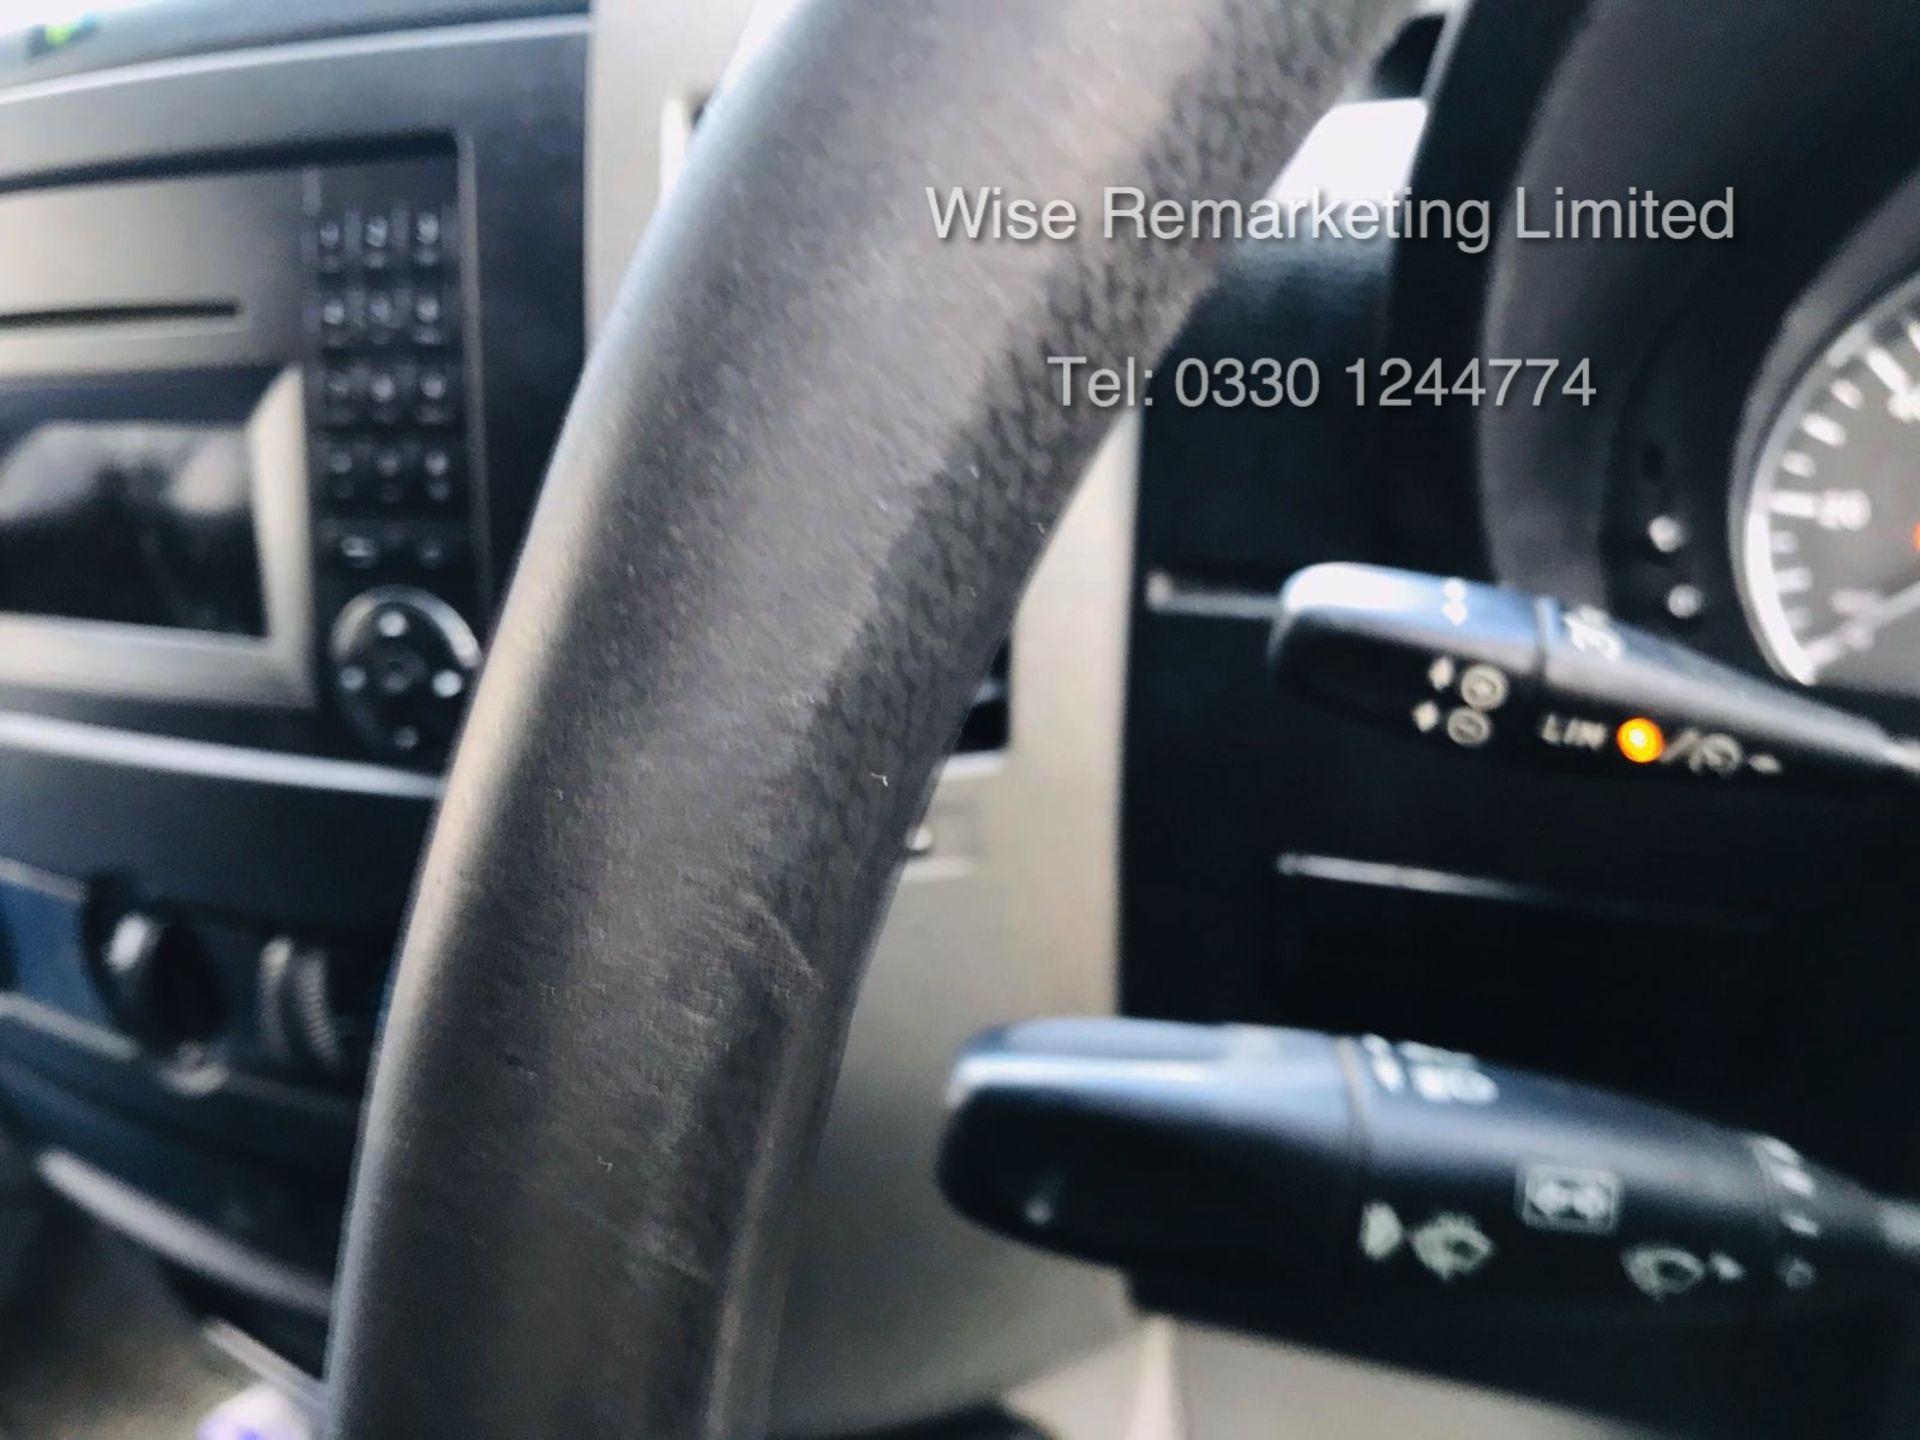 Mercedes Sprinter 313 CDI 2.1 TD Long Wheel Base 6 Speed - 2014 Model - Image 16 of 19